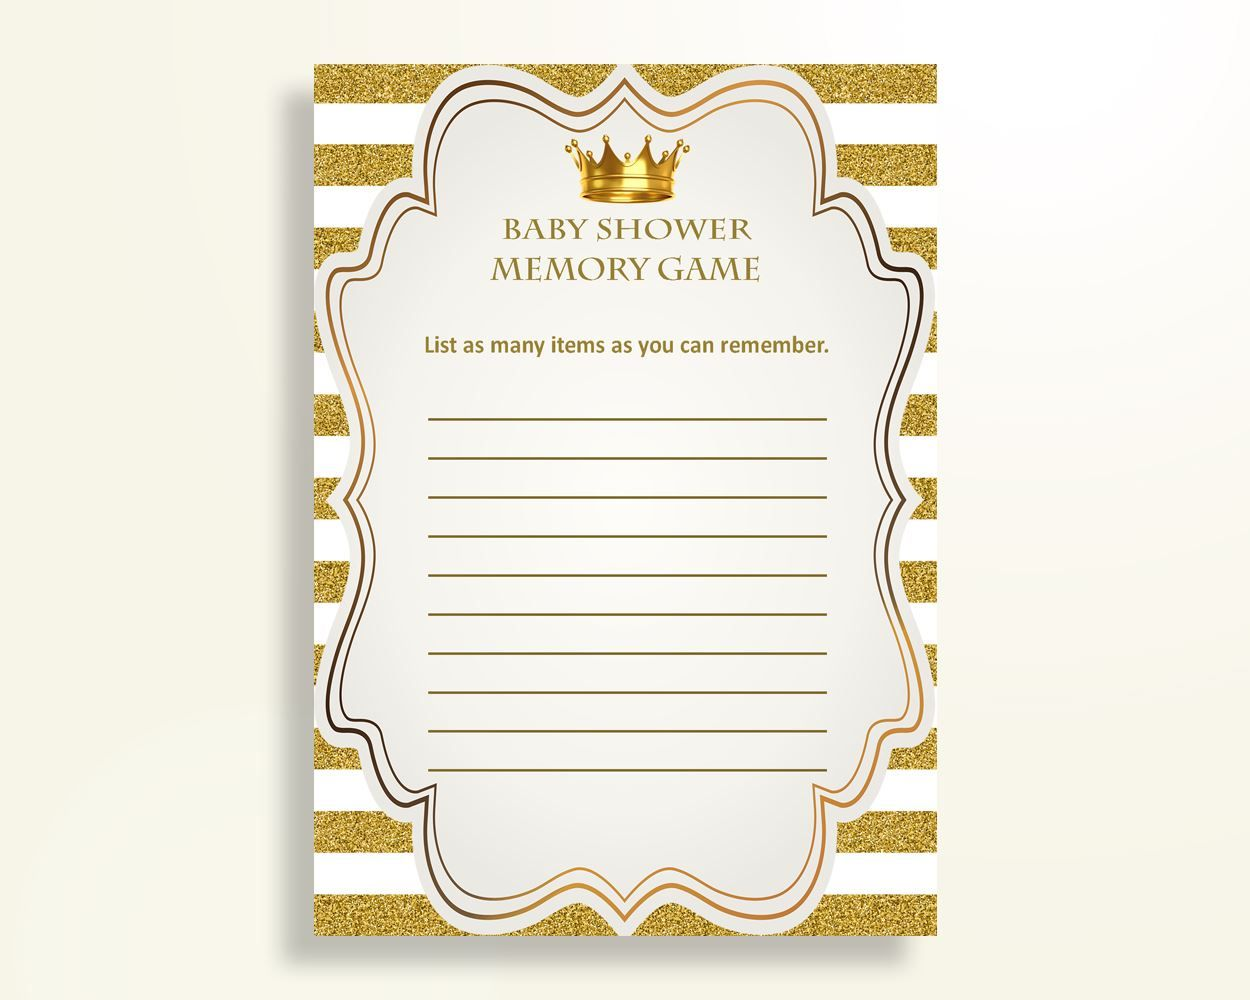 Memory Game Baby Shower Memory Game Royal Baby Shower Memory Game Gold  White Baby Shower Gold